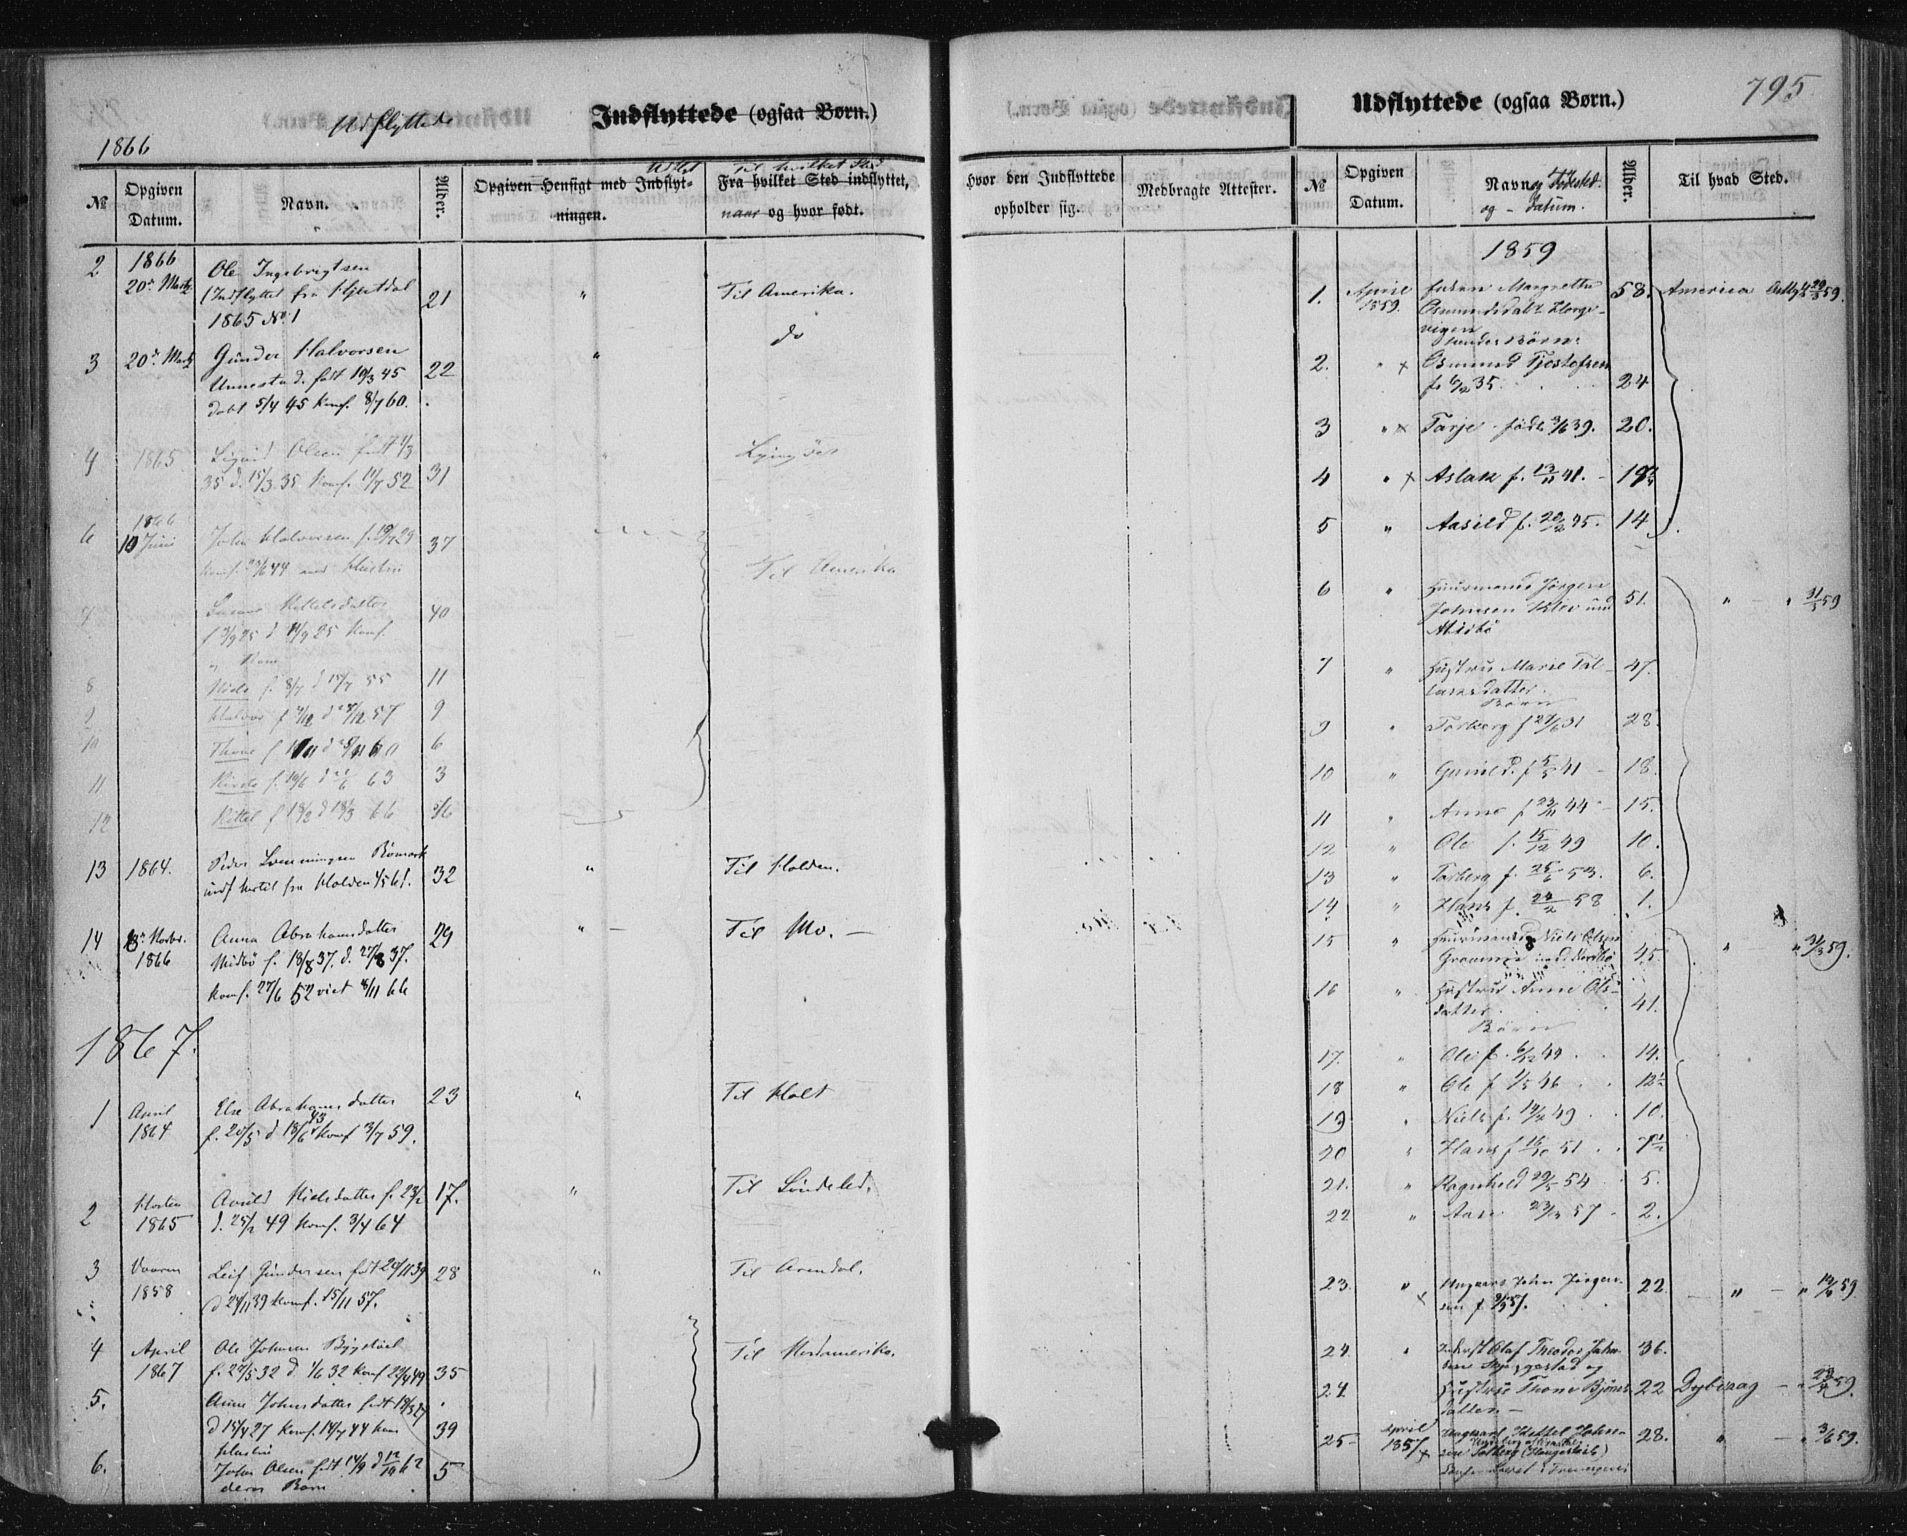 SAKO, Nissedal kirkebøker, F/Fa/L0003: Ministerialbok nr. I 3, 1846-1870, s. 794-795